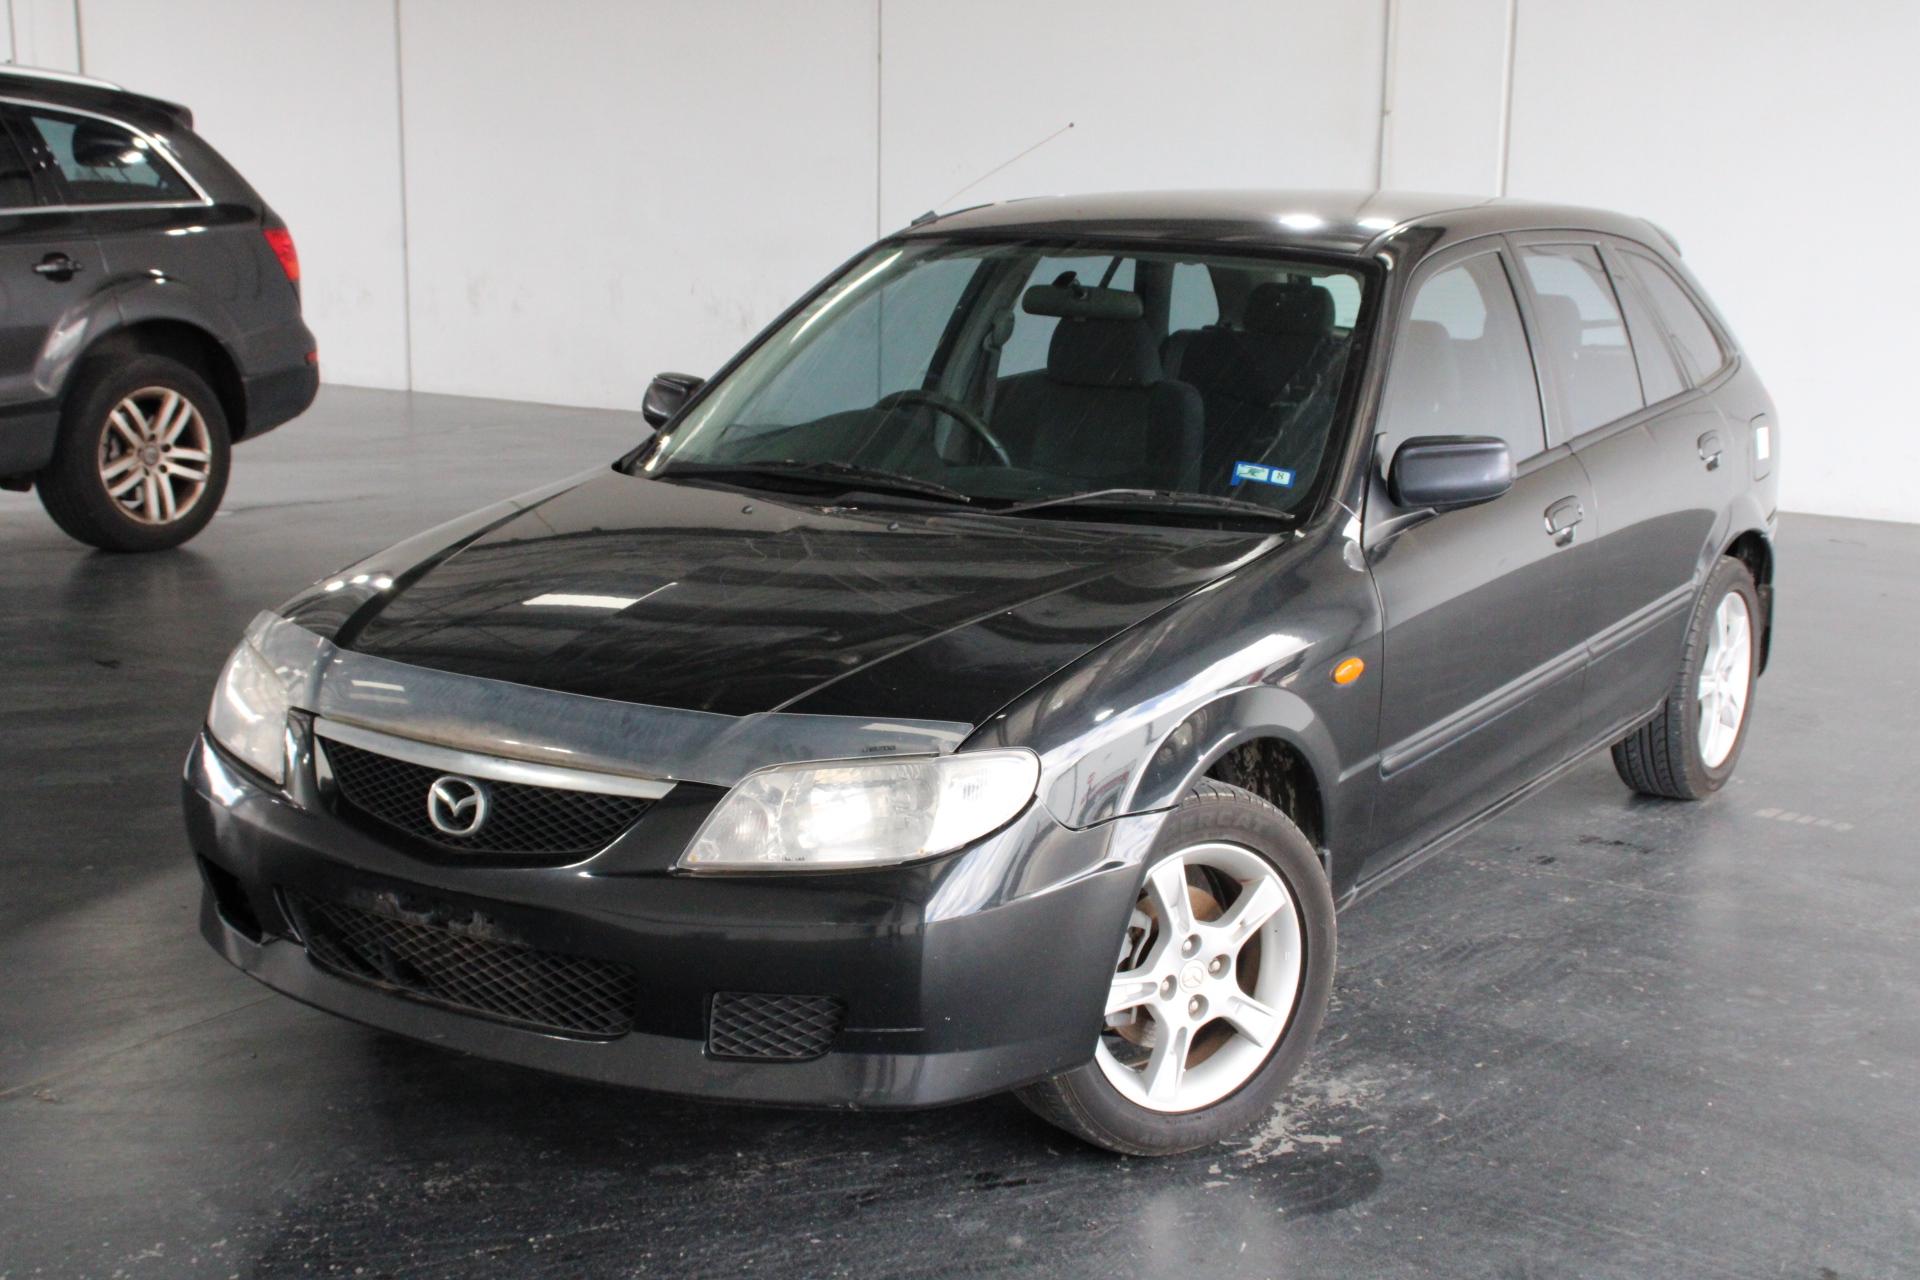 2003 Mazda 323 Astina Shades BJ Automatic Hatchback